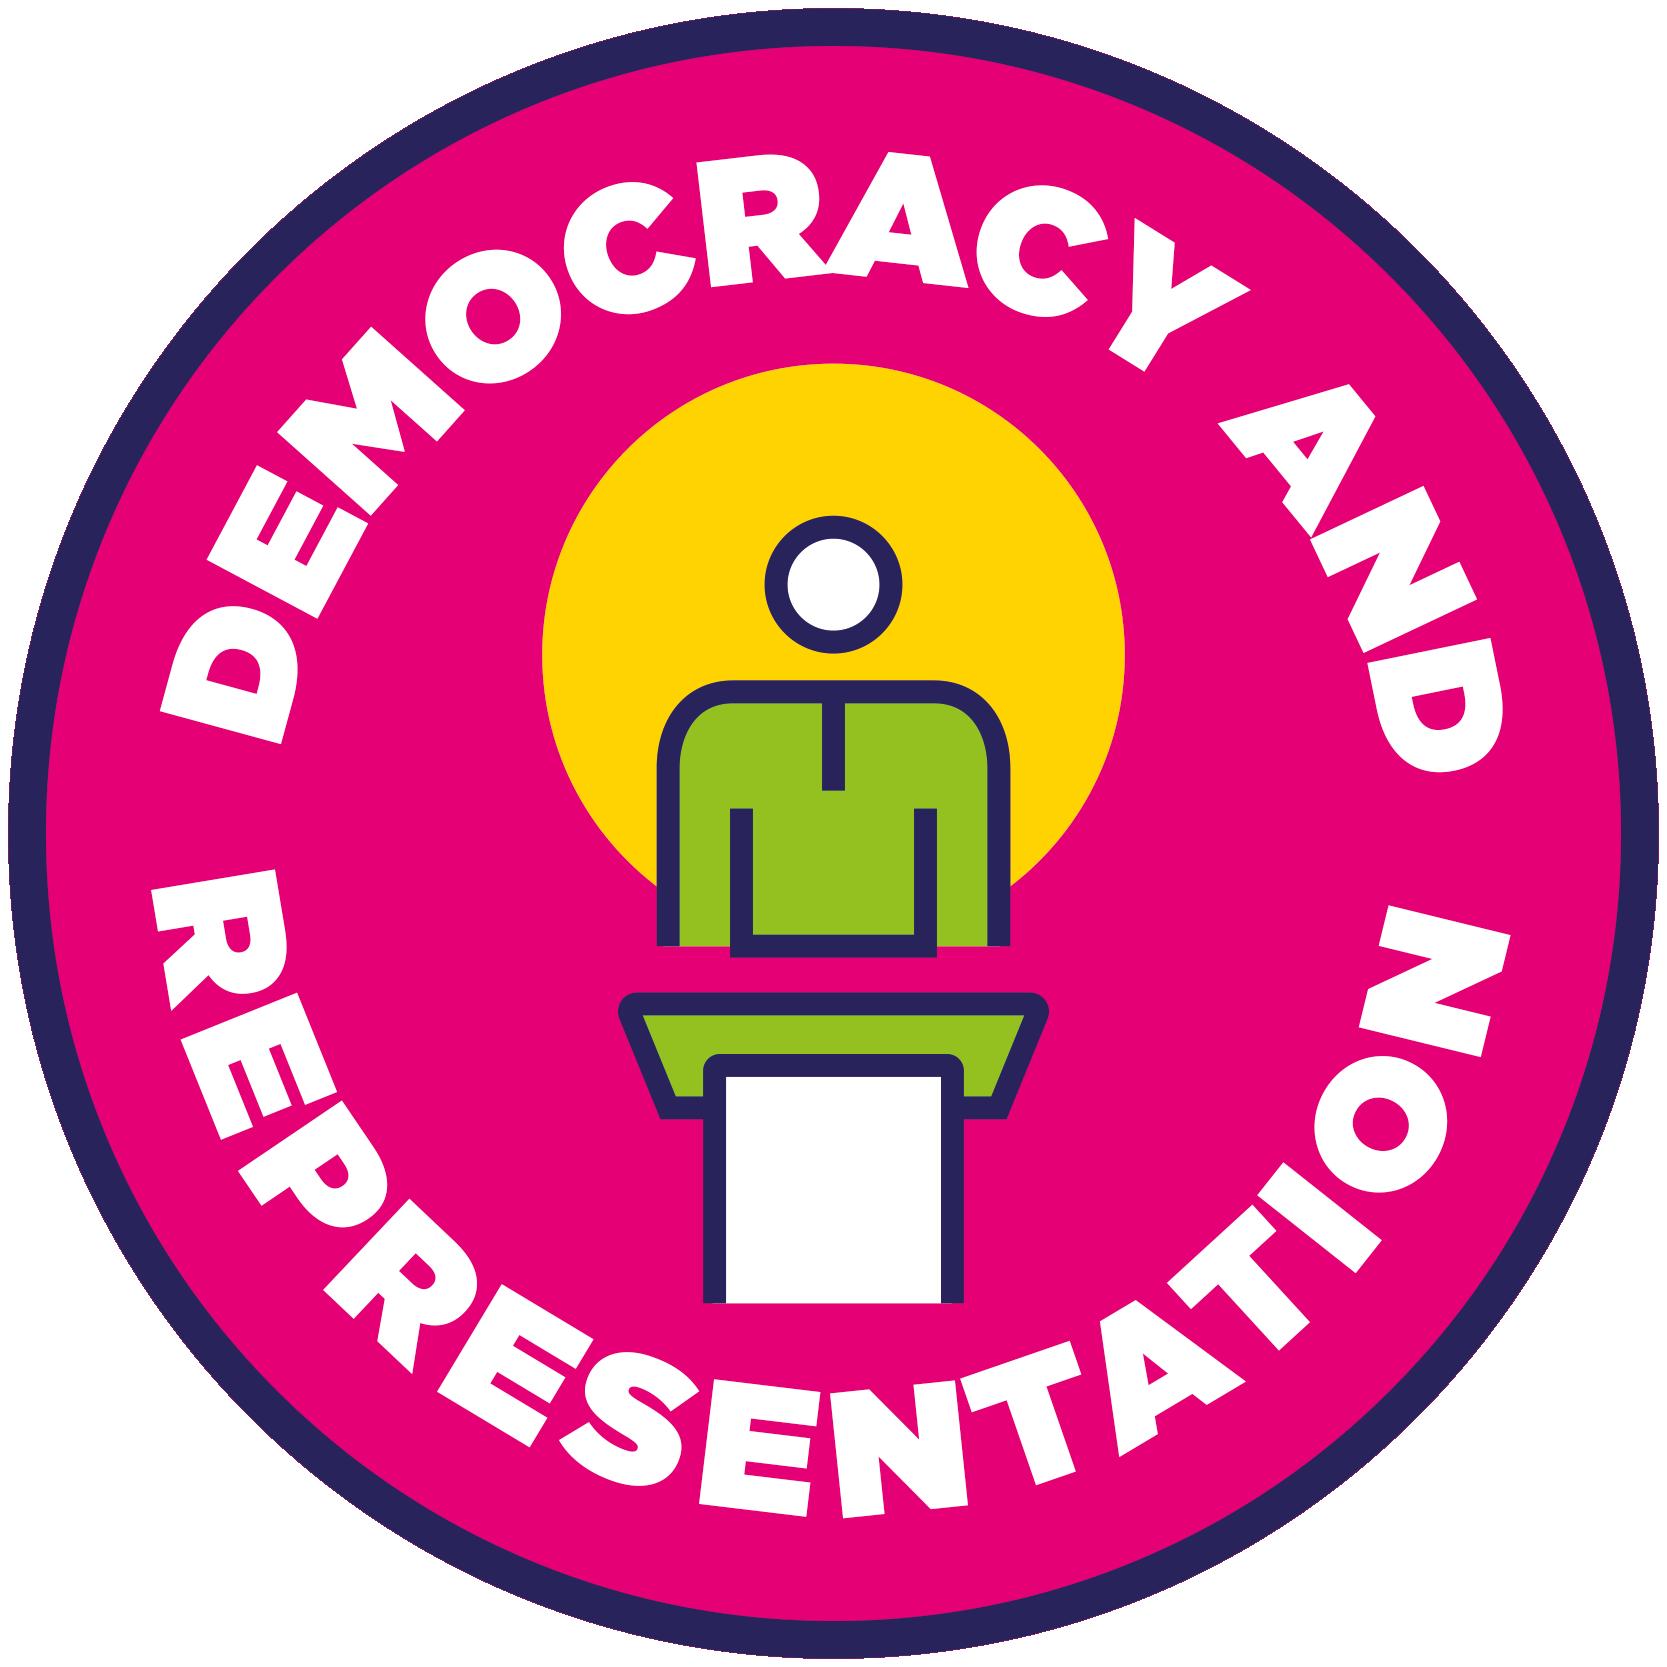 Democracy and representation